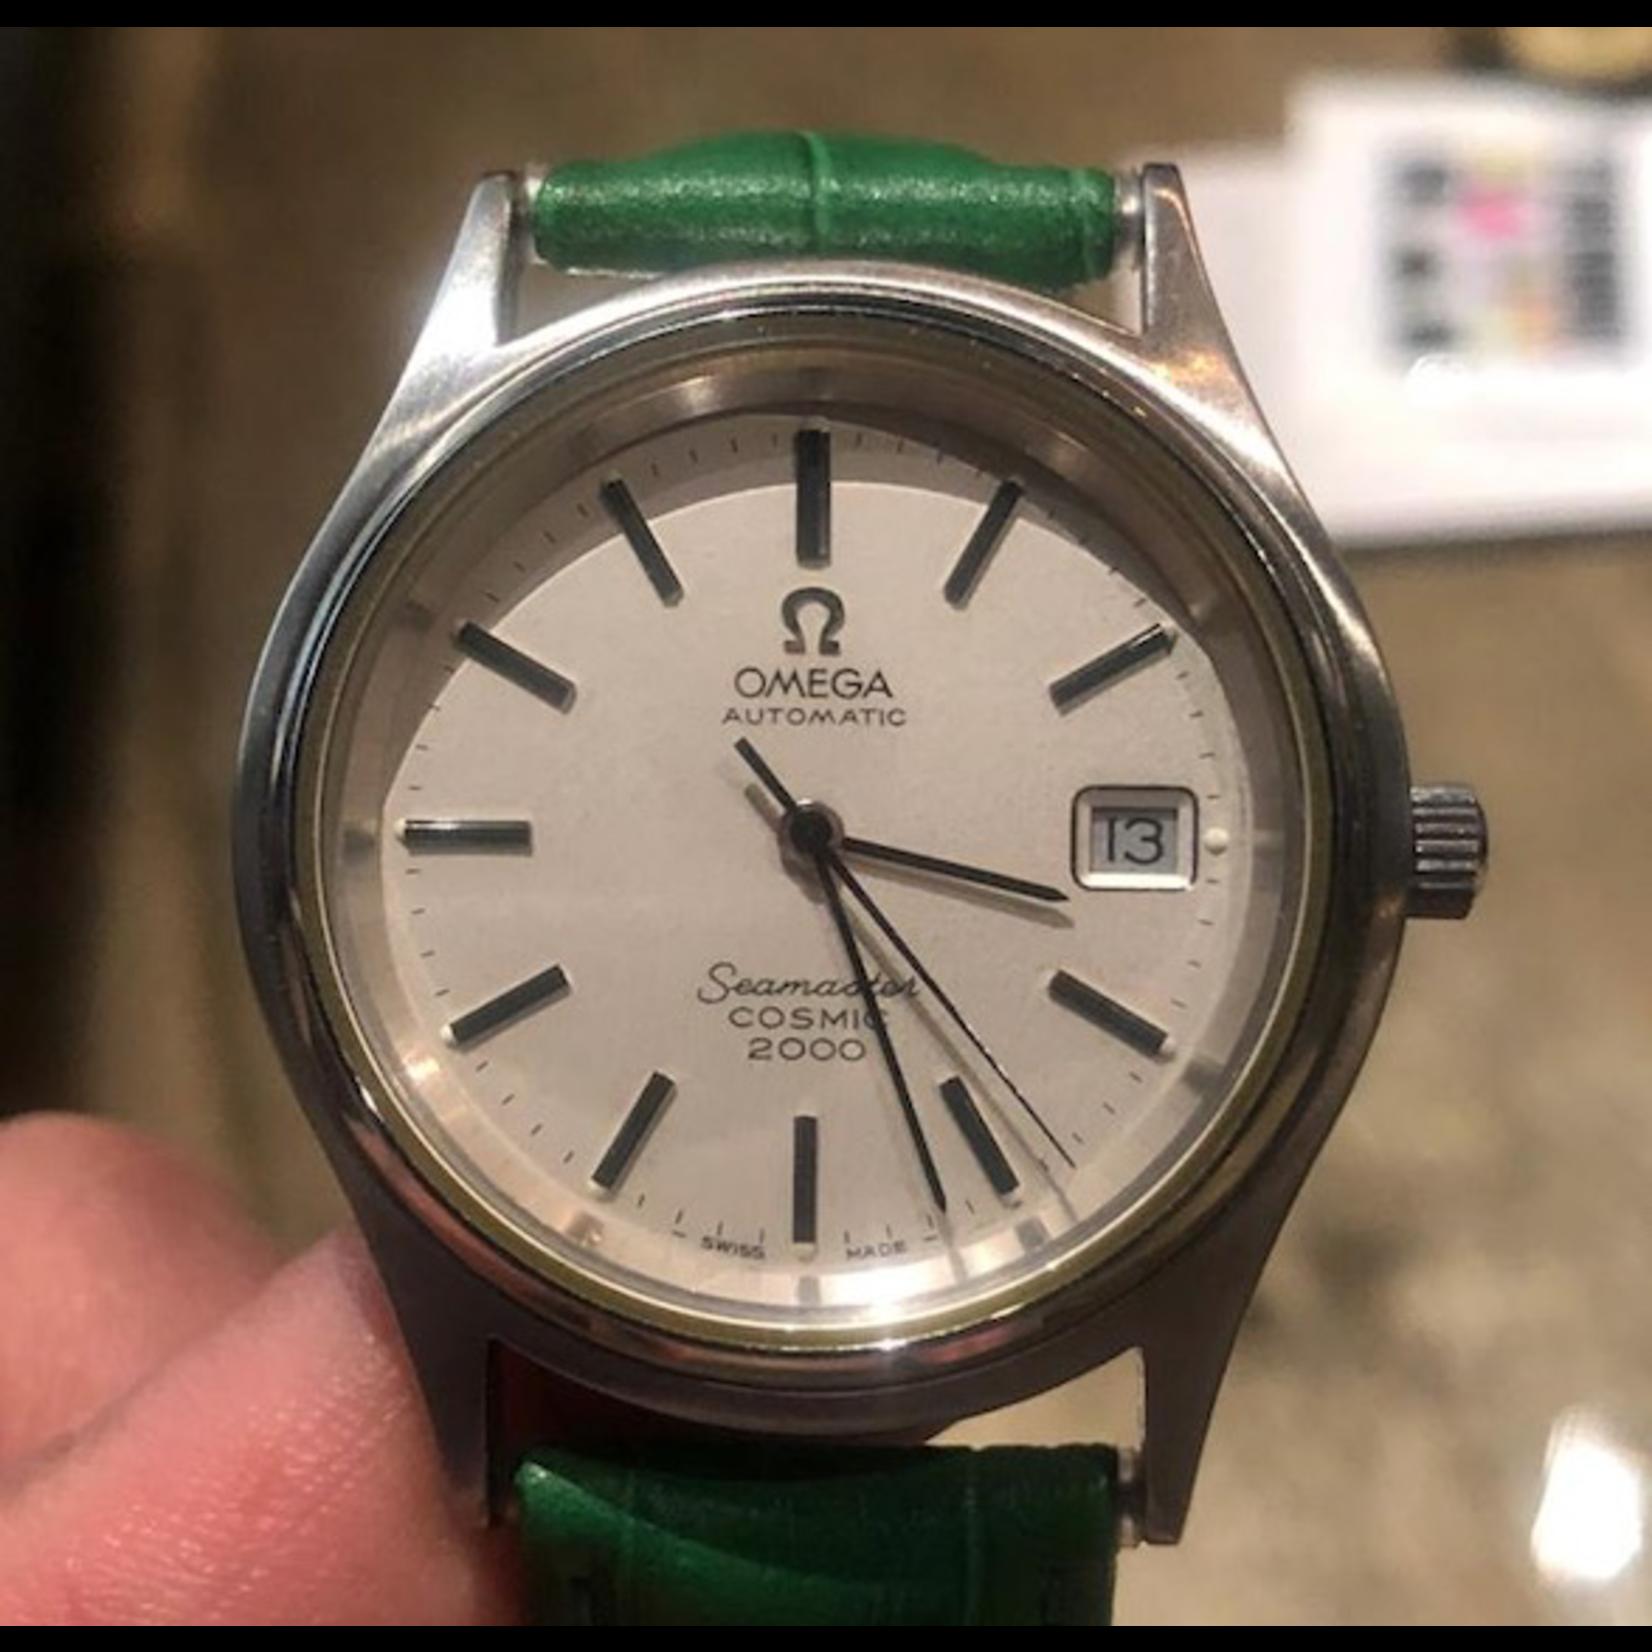 TAJHOME Vintage Watch Omega Seamaster COSMIC 2000